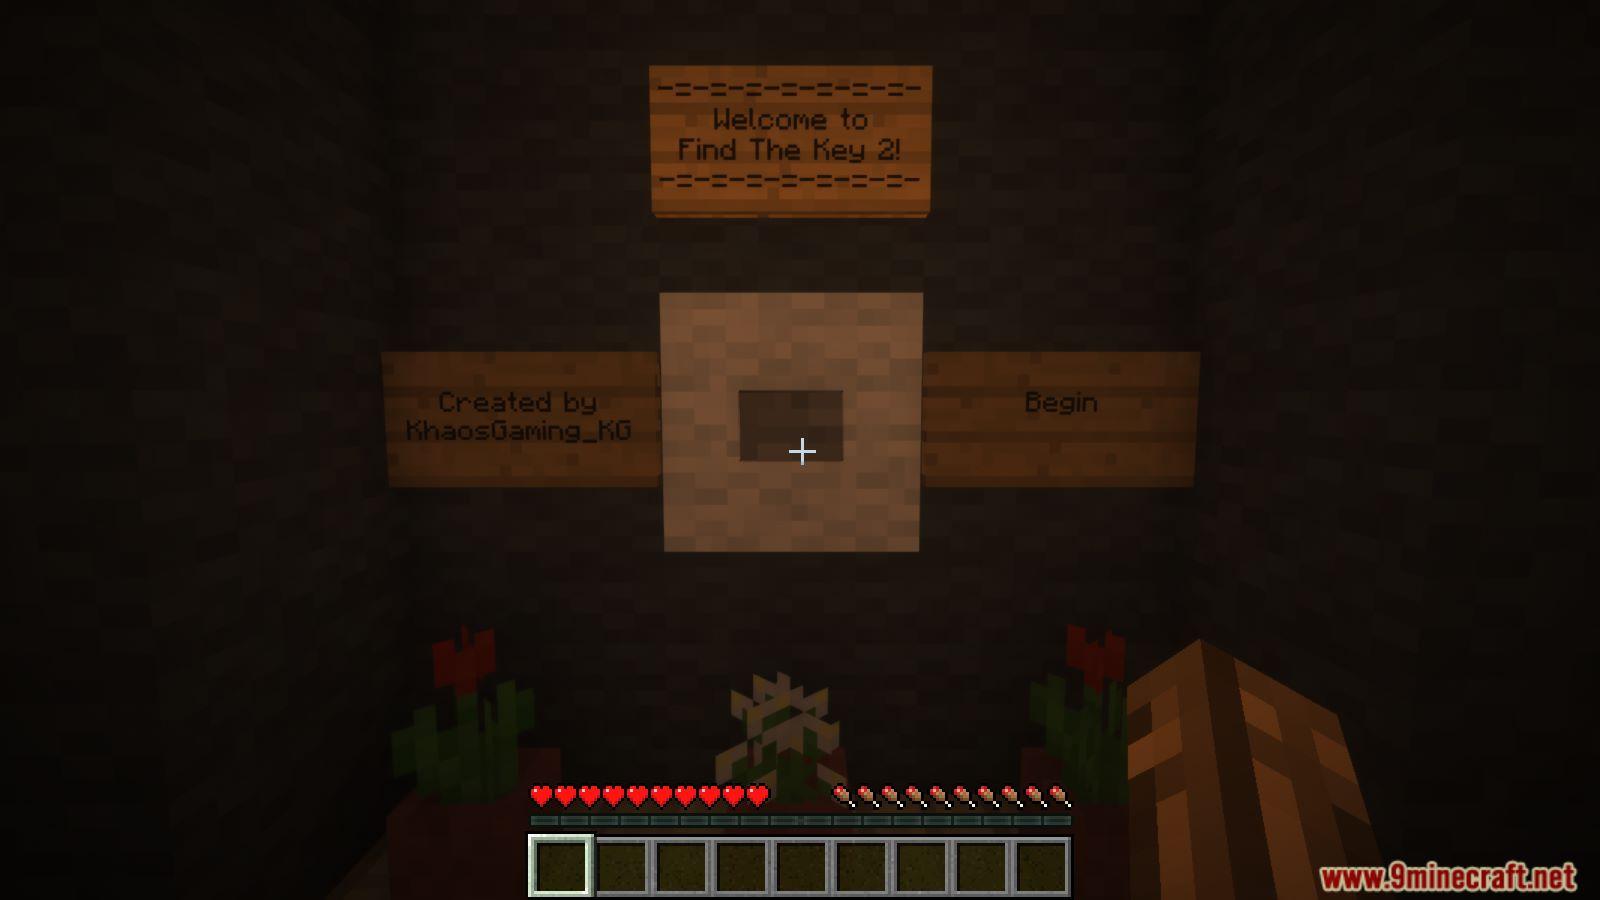 Find The Key 2 Map Screenshots (1)